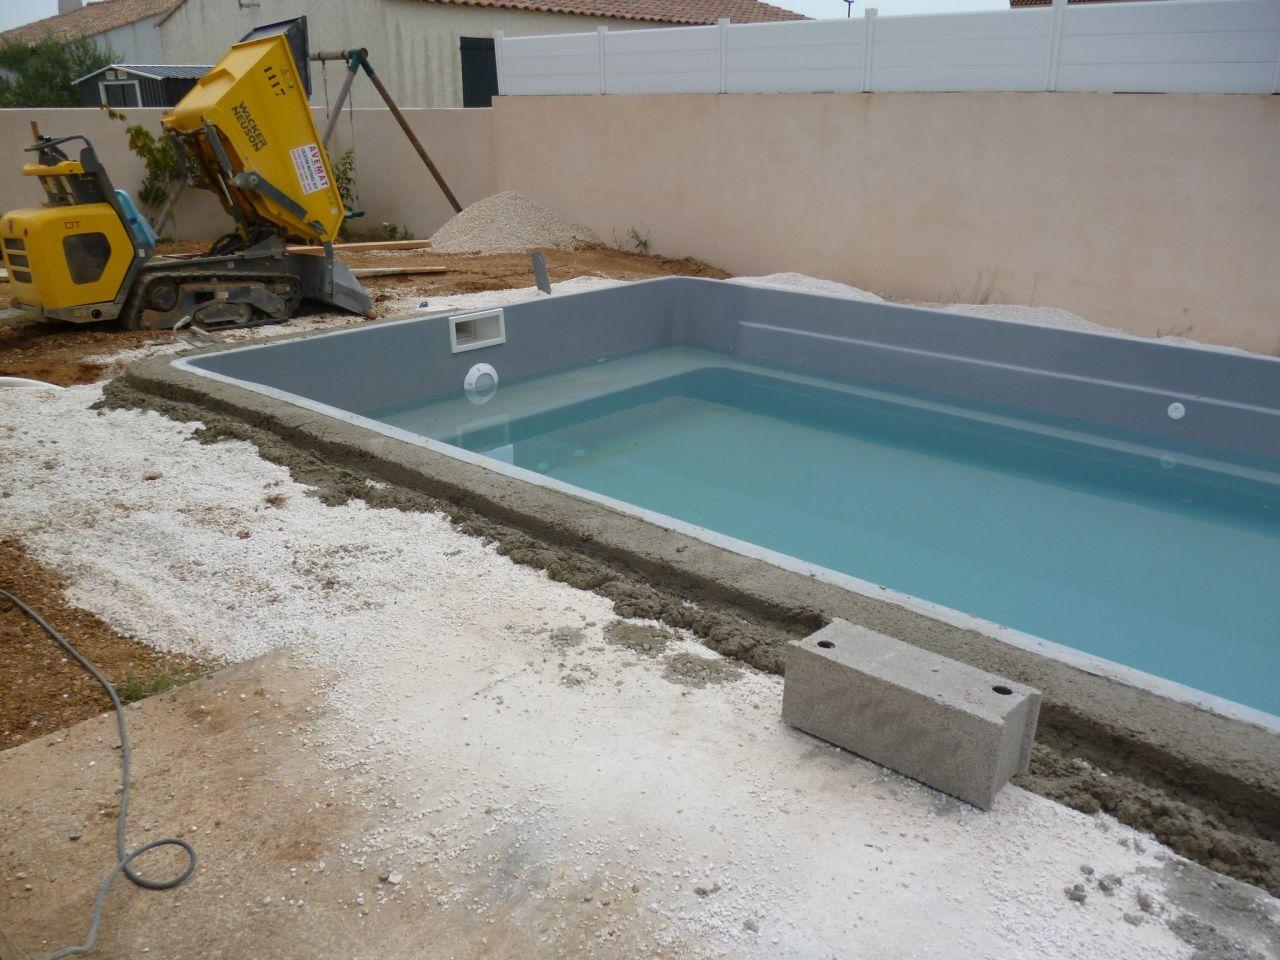 Photo ceinture b ton construction pose de la piscine for Ceinture beton piscine